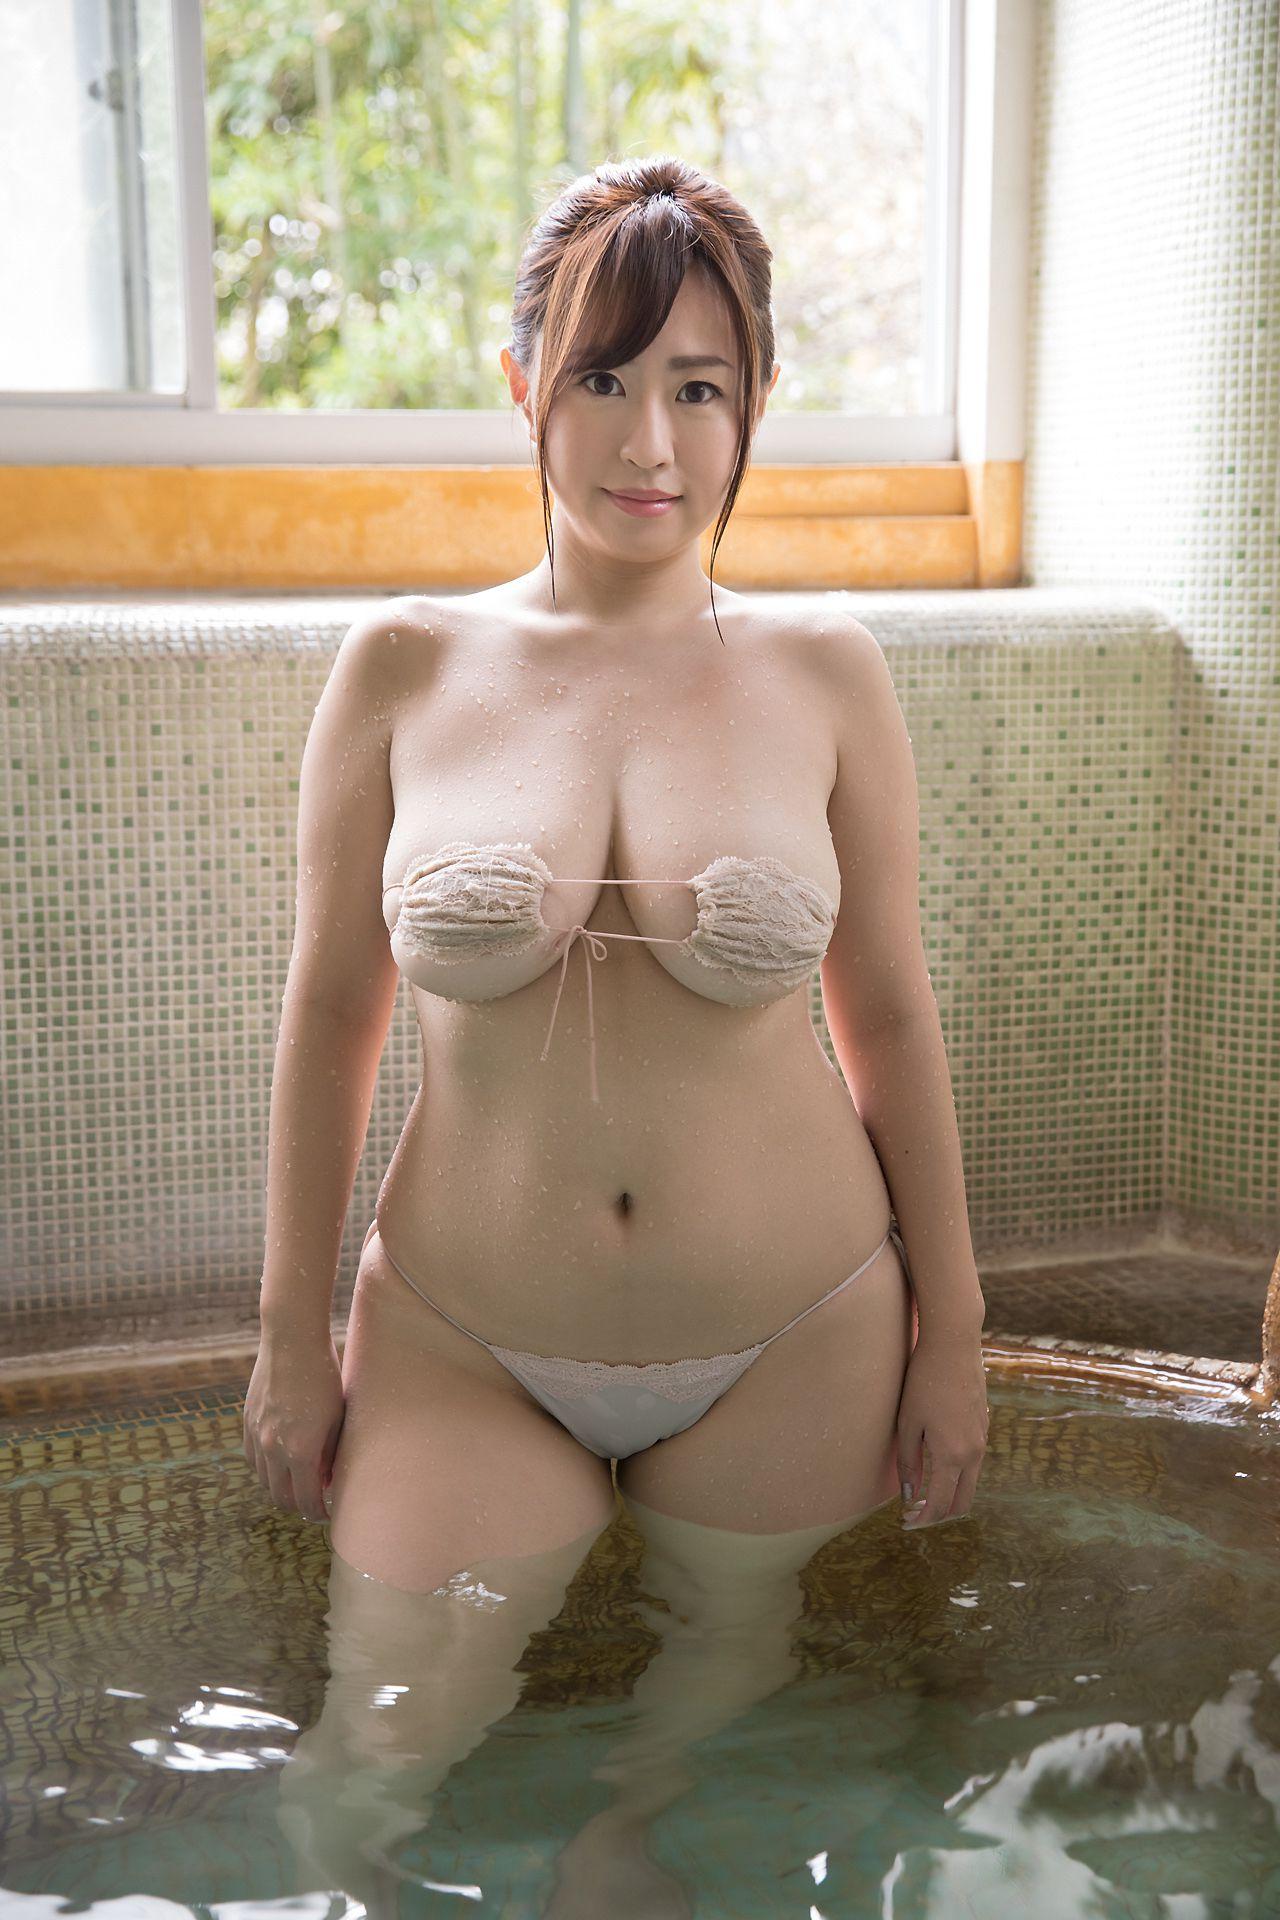 [Minisuka.tv] 水樹たま - 巨乳沐浴系列 Limited Gallery 3.4